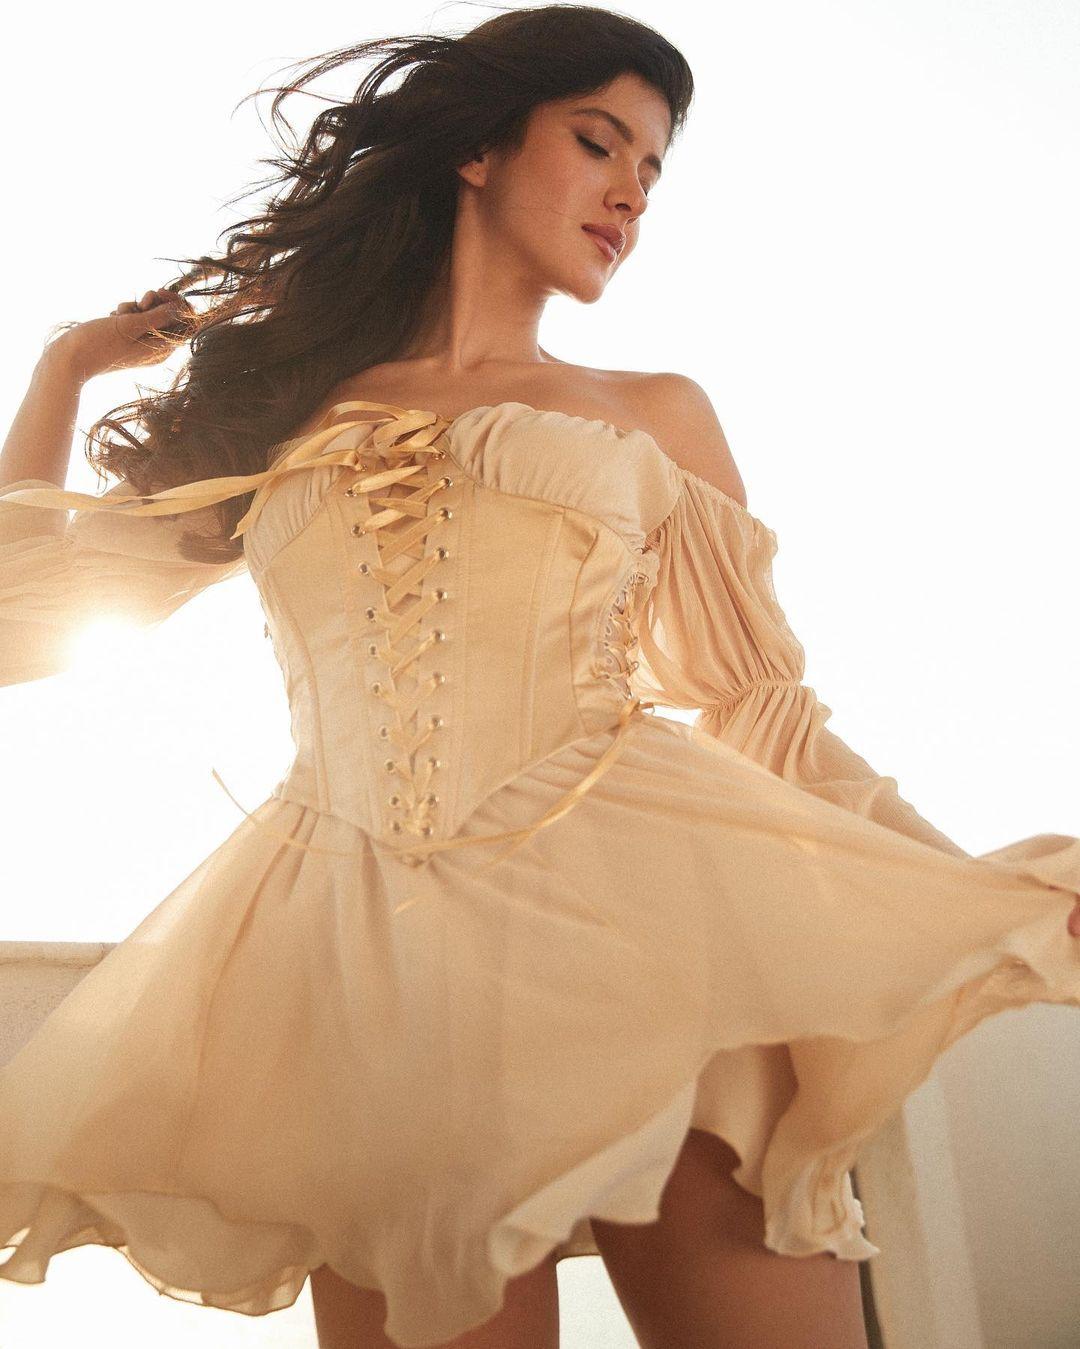 glamorous Shanaya Kapoor